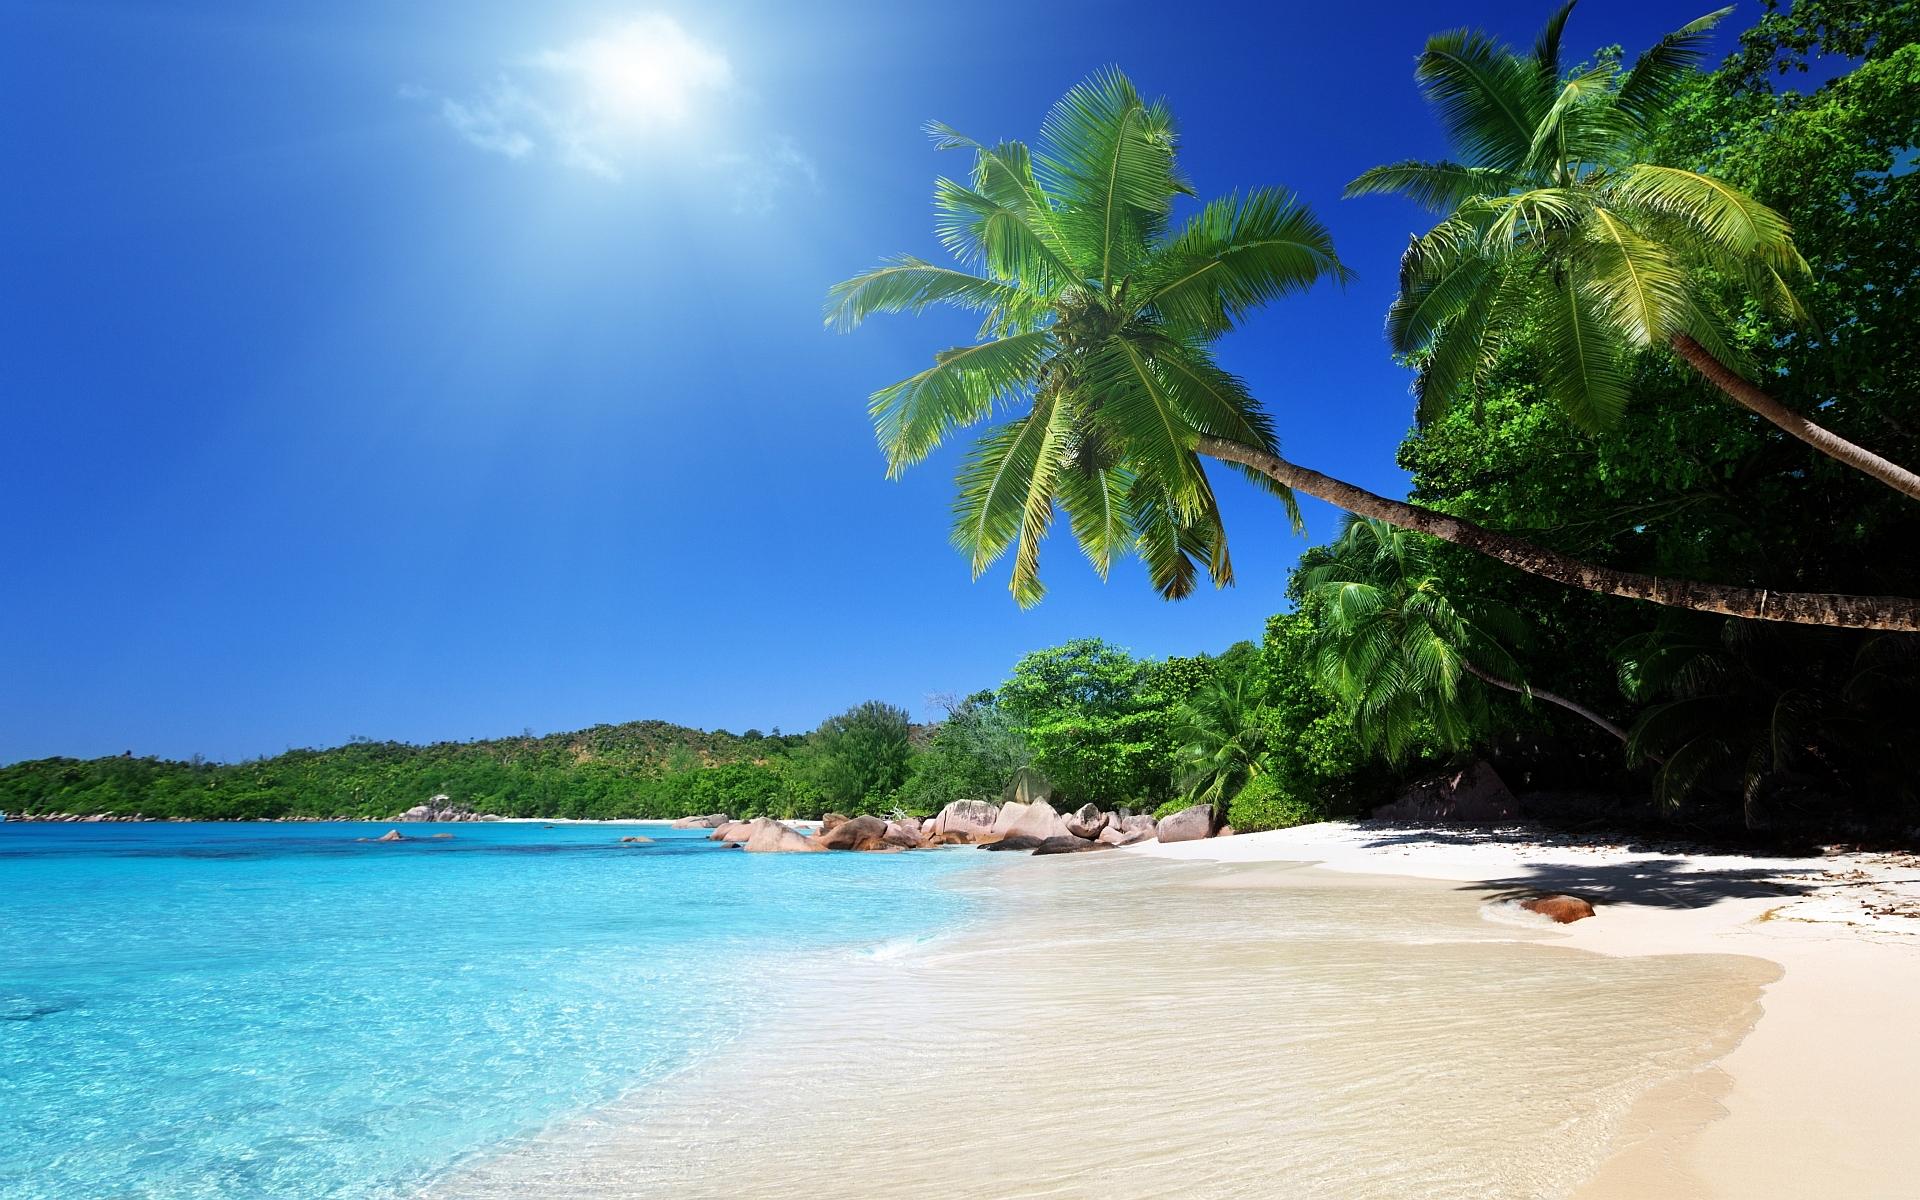 Stunning Beach Screensavers